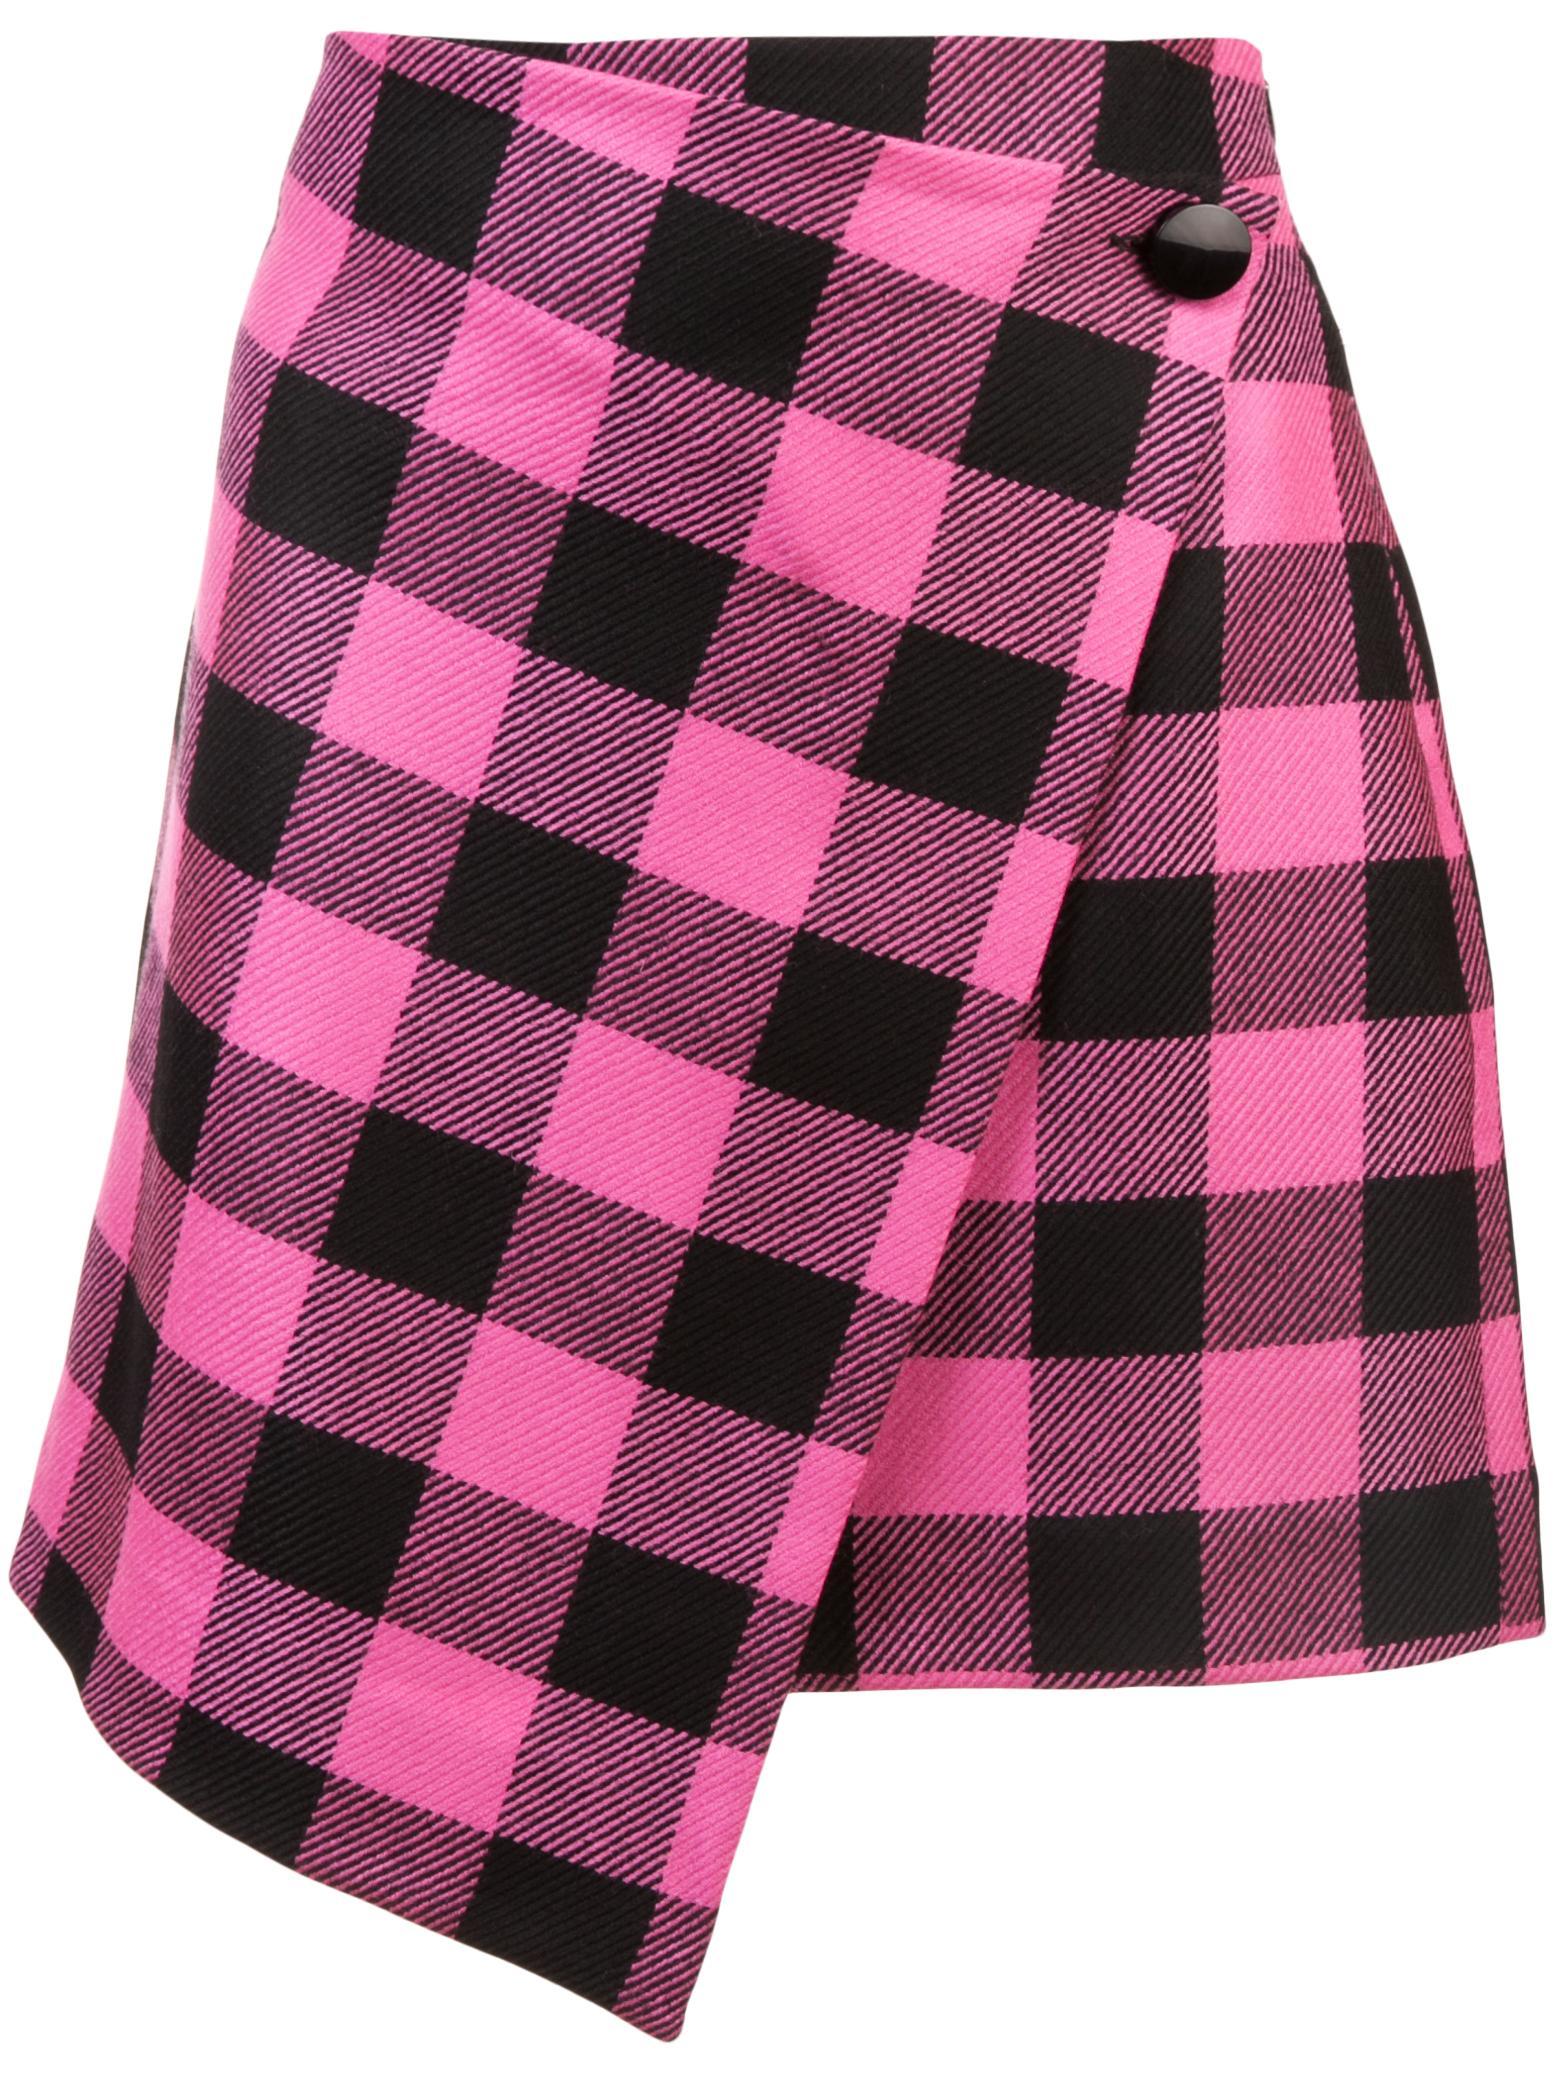 Buffalo Check Wrap Mini Skirt Item # 213BC02927